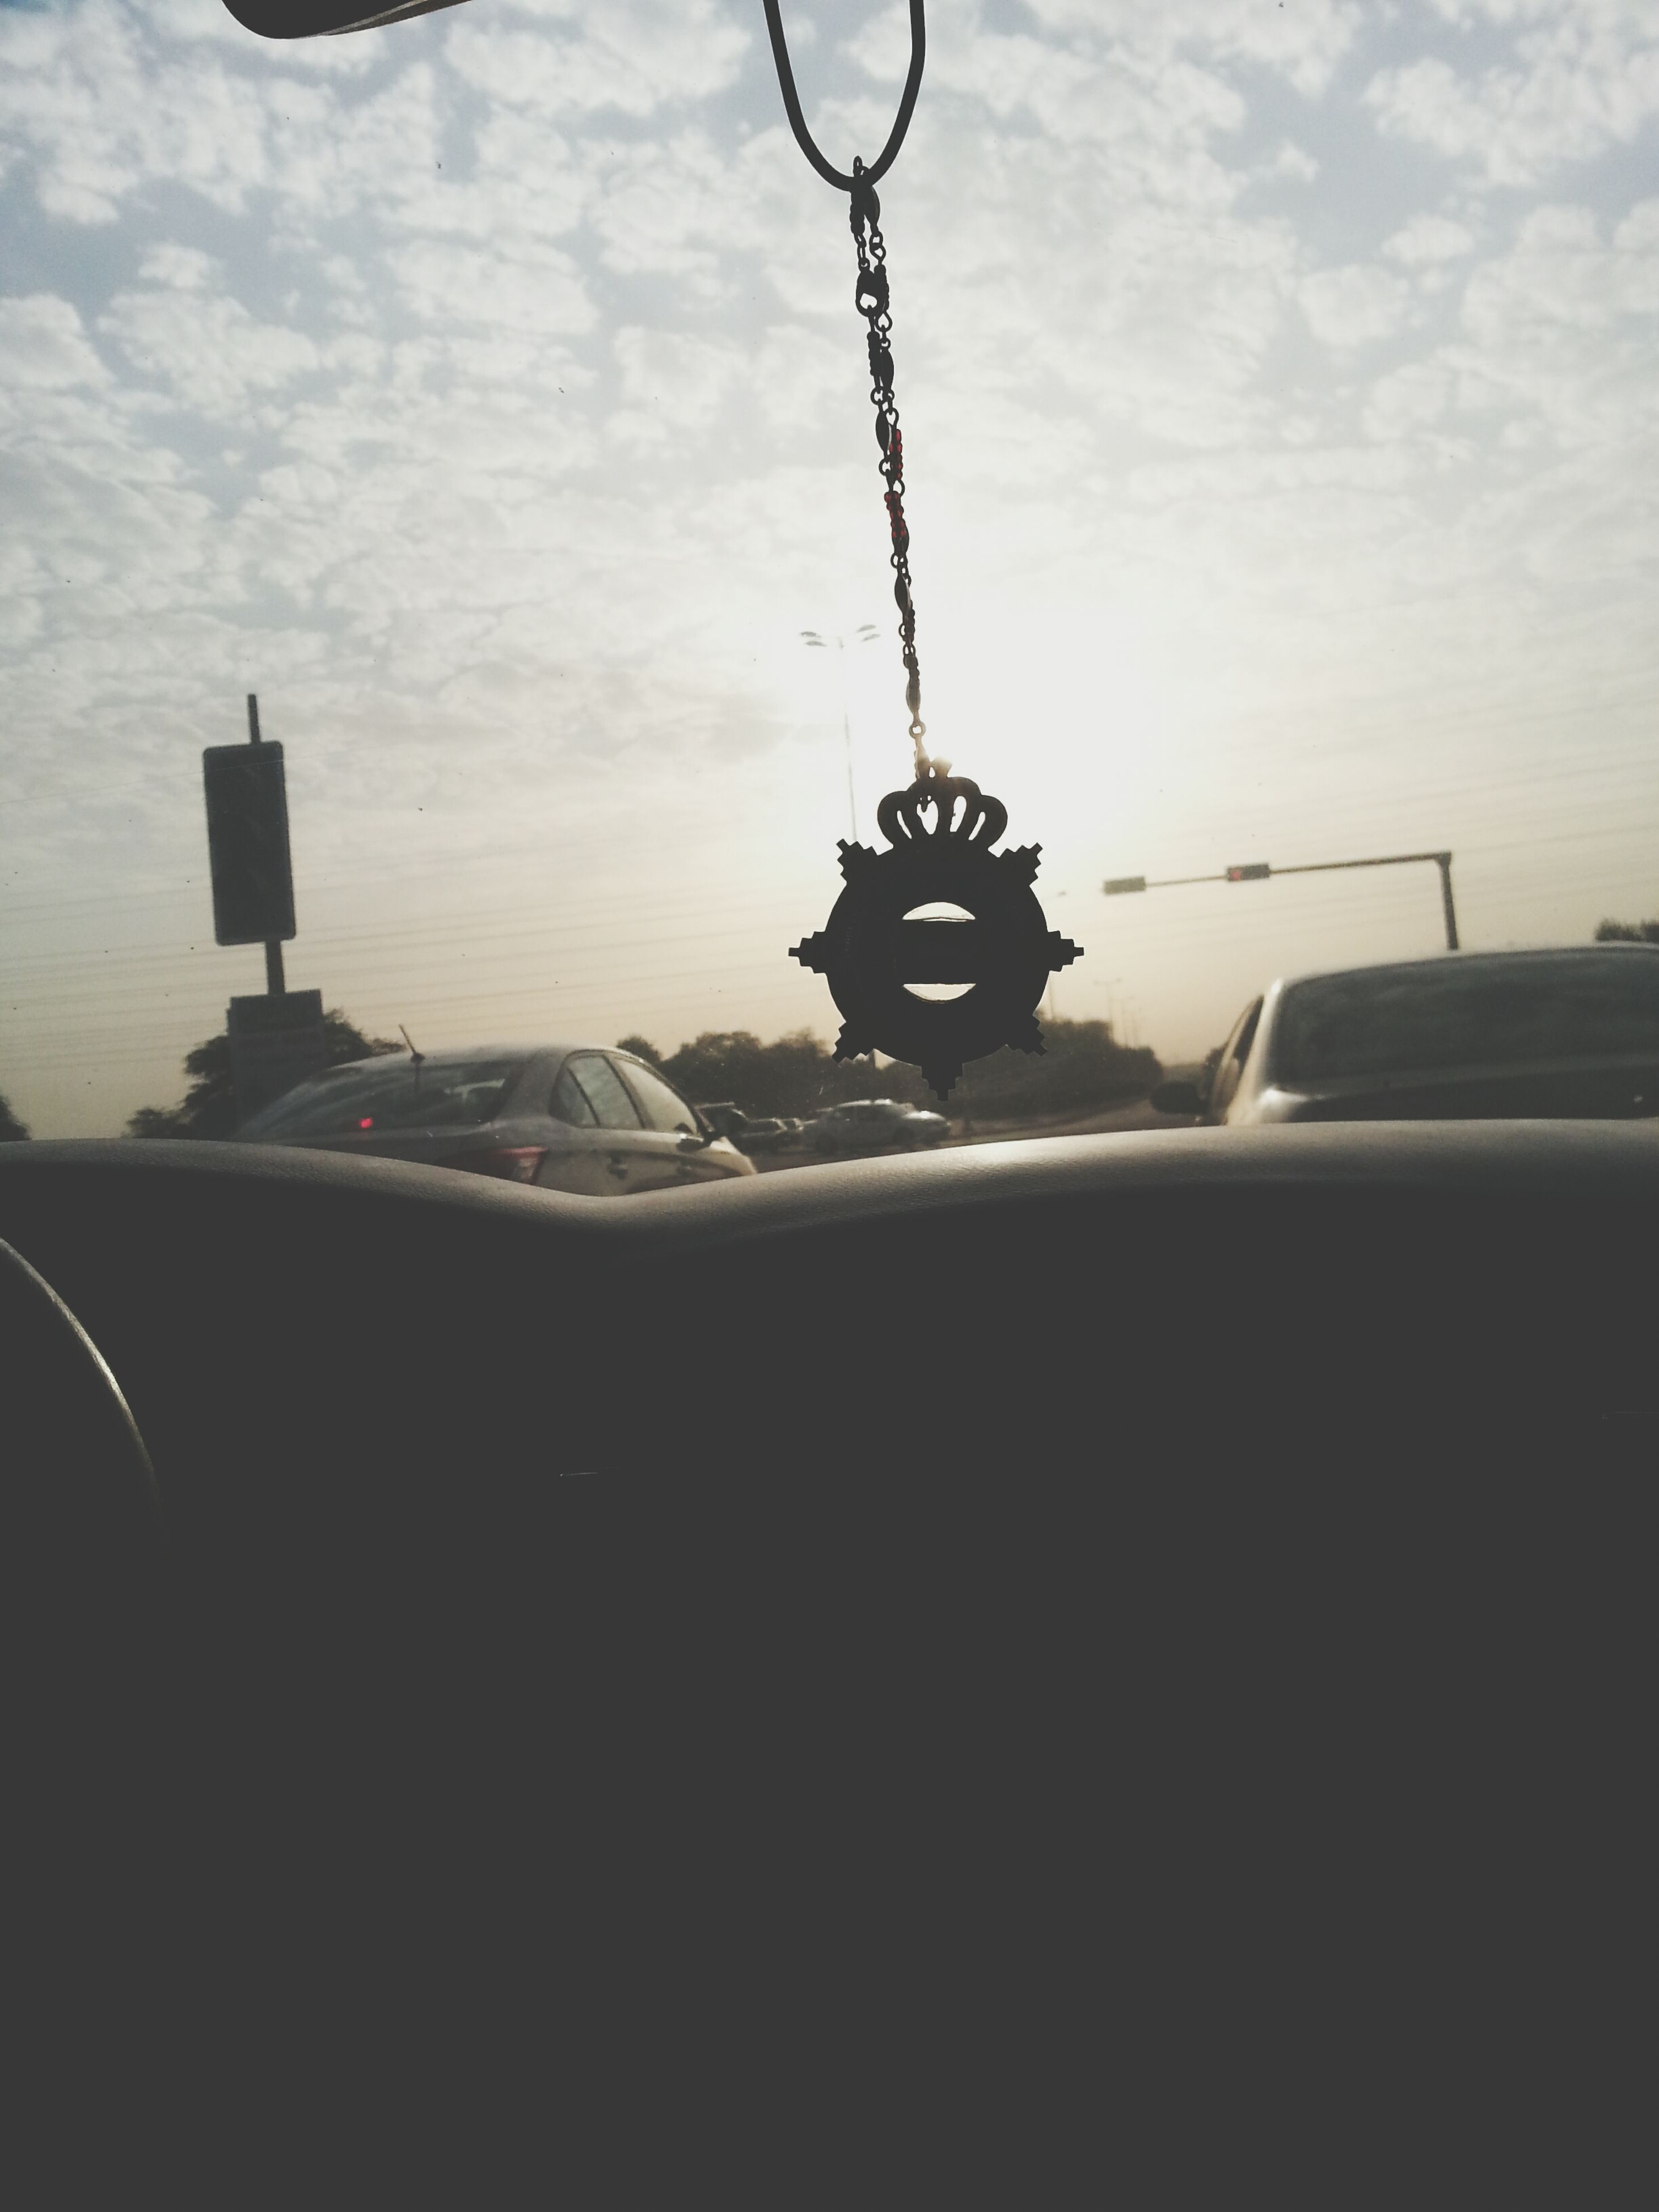 sky, transportation, cloud - sky, mode of transport, lighting equipment, hanging, no people, sea, water, cloud, tranquility, nature, outdoors, close-up, car, part of, metal, street light, scenics, sunset